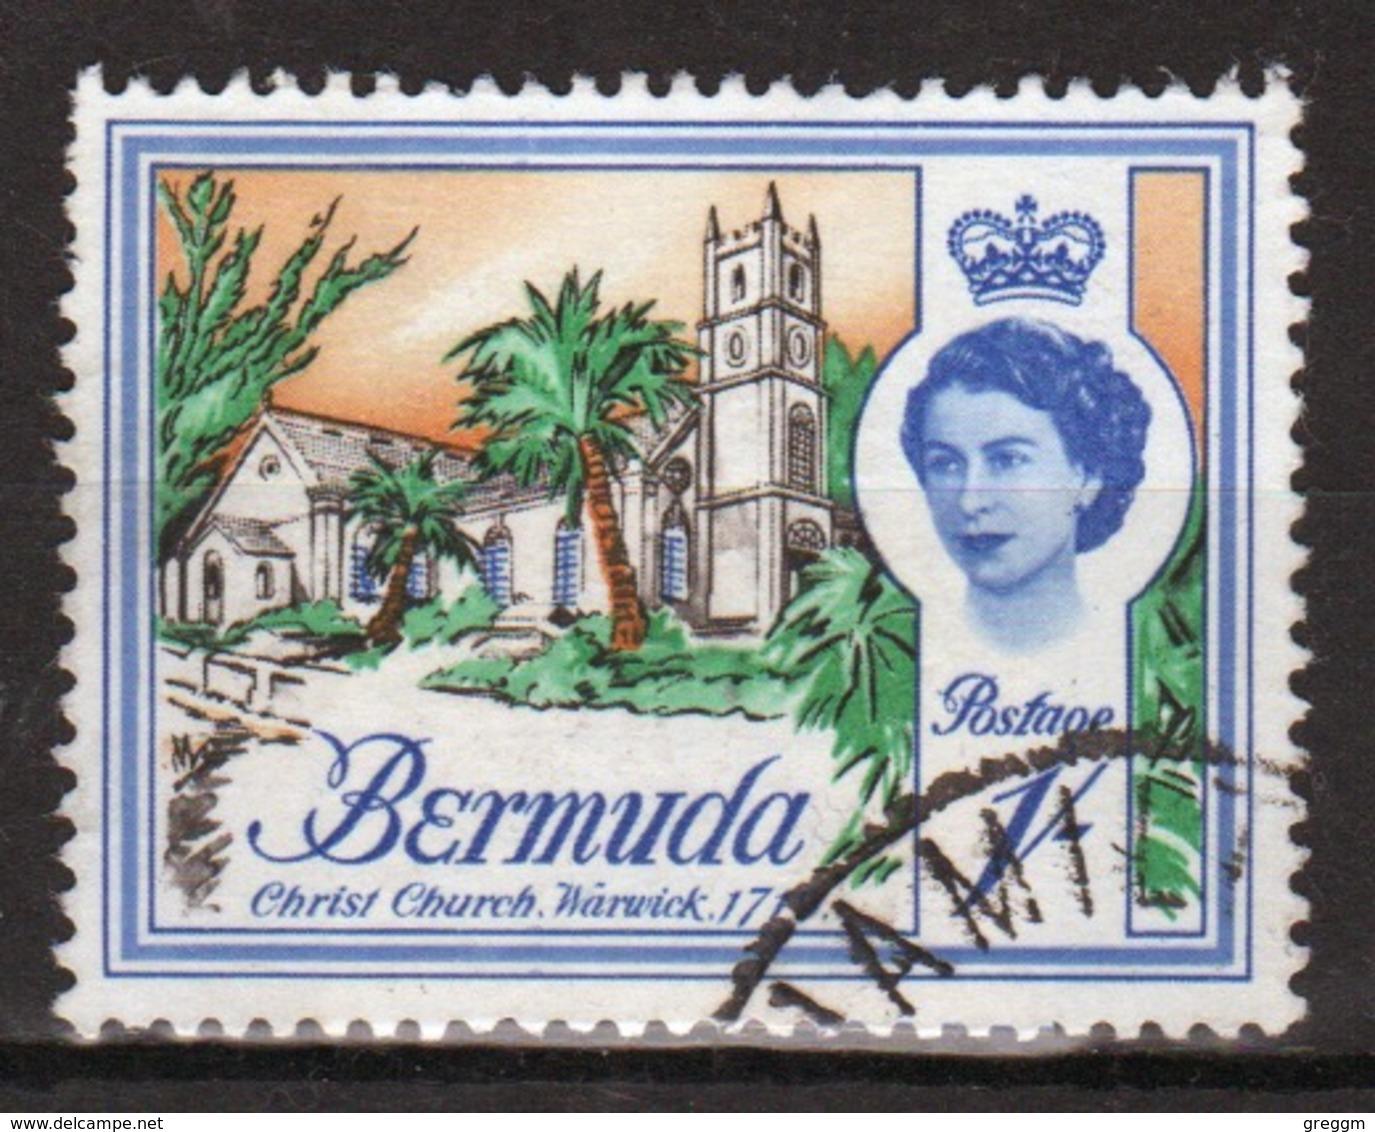 Bermuda Elizabeth II 1962 Single 1/- Stamp From The Definitive Set. - Bermuda